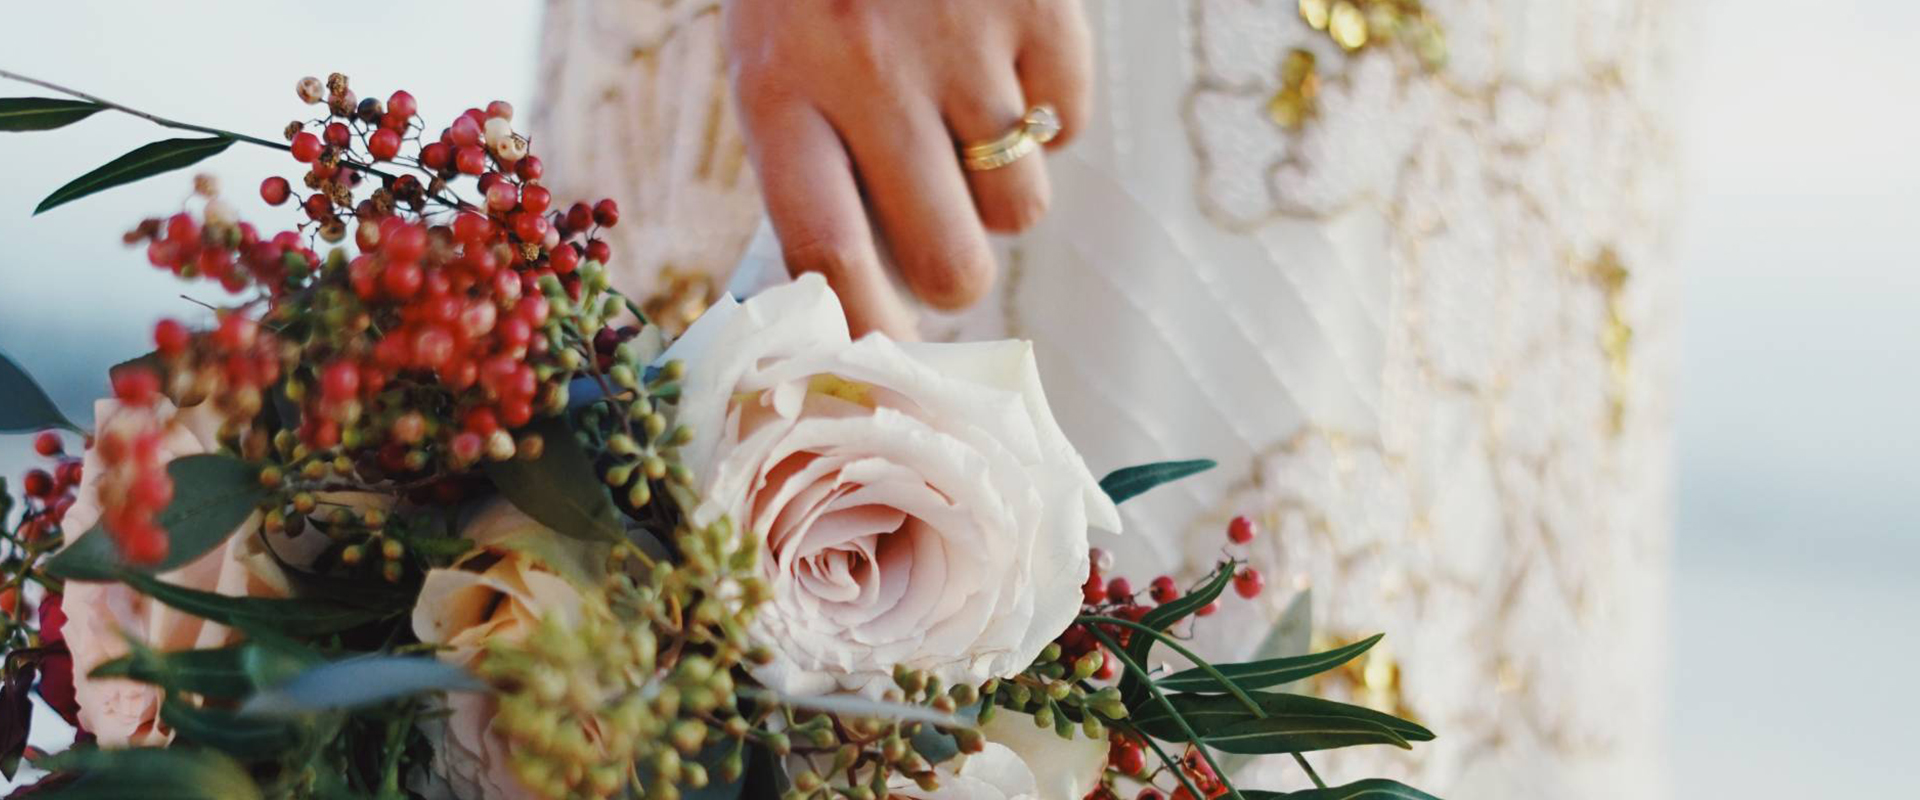 Organizare nunta si botez in Suceava, Falticeni, Piatra Neamt